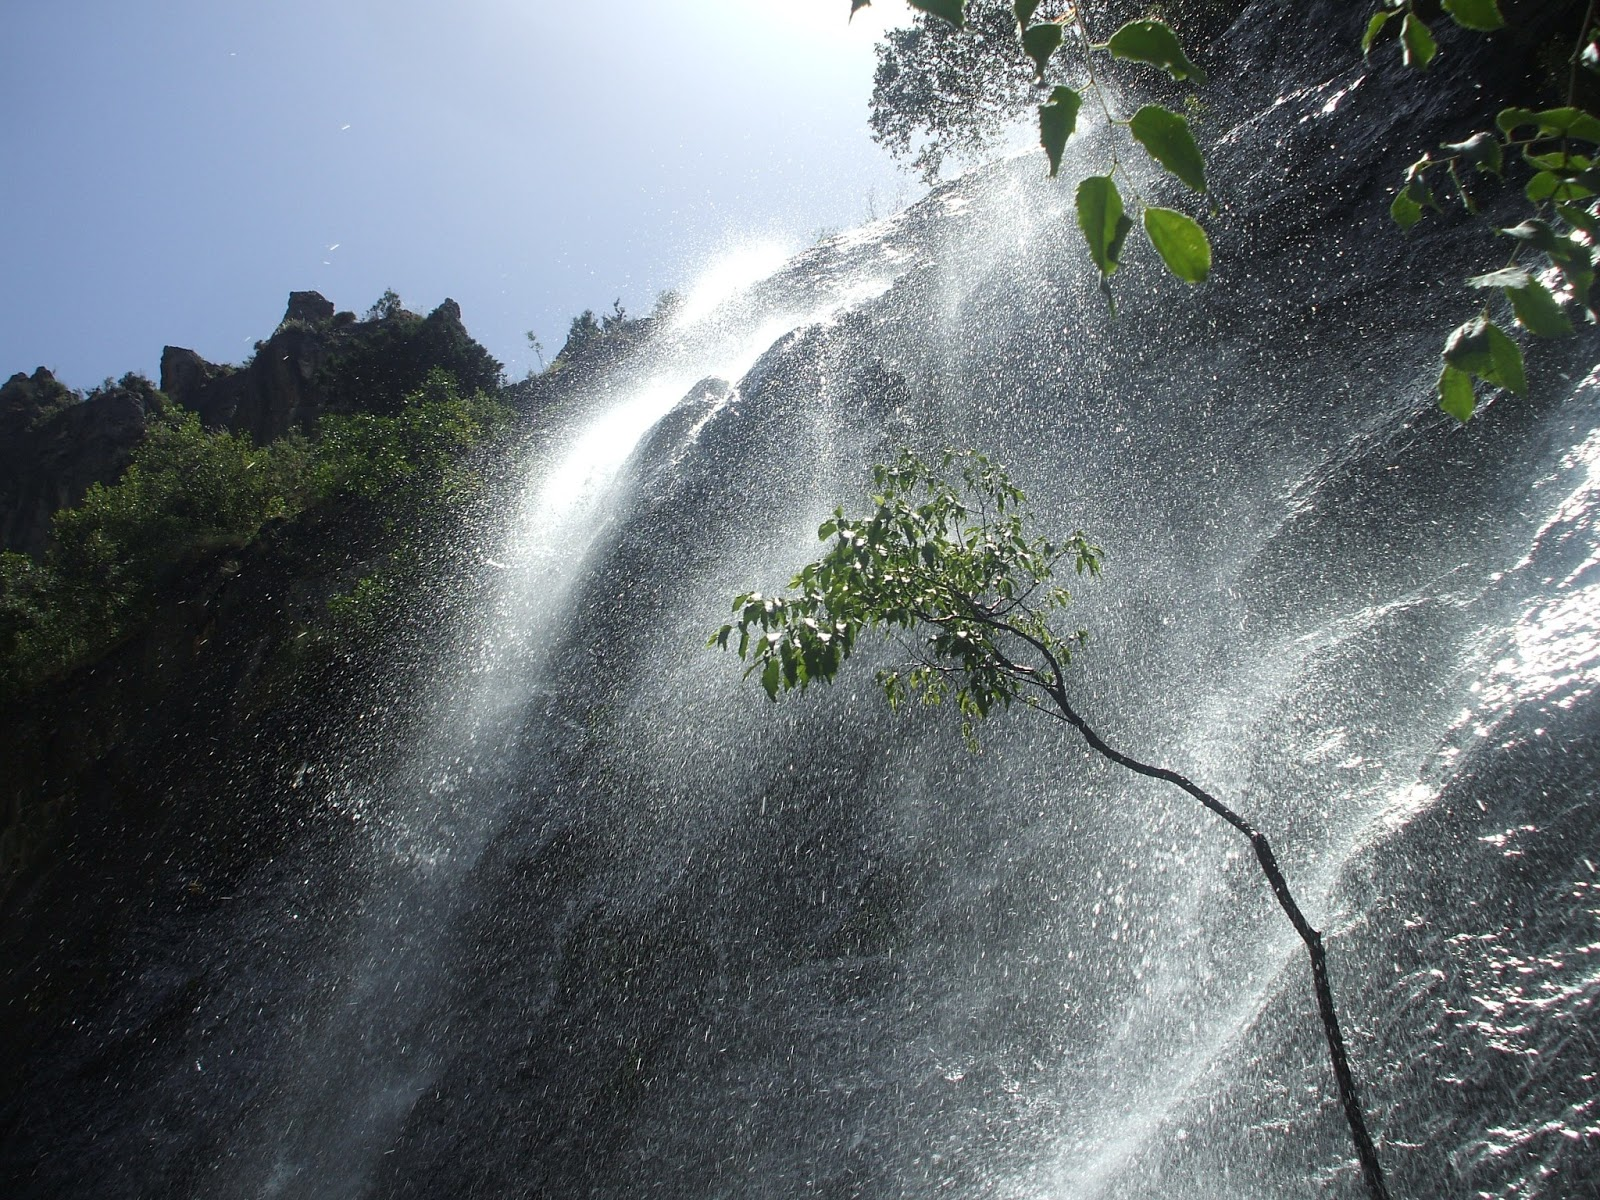 Waterfall in Los Cahorros, Monachil, Granada